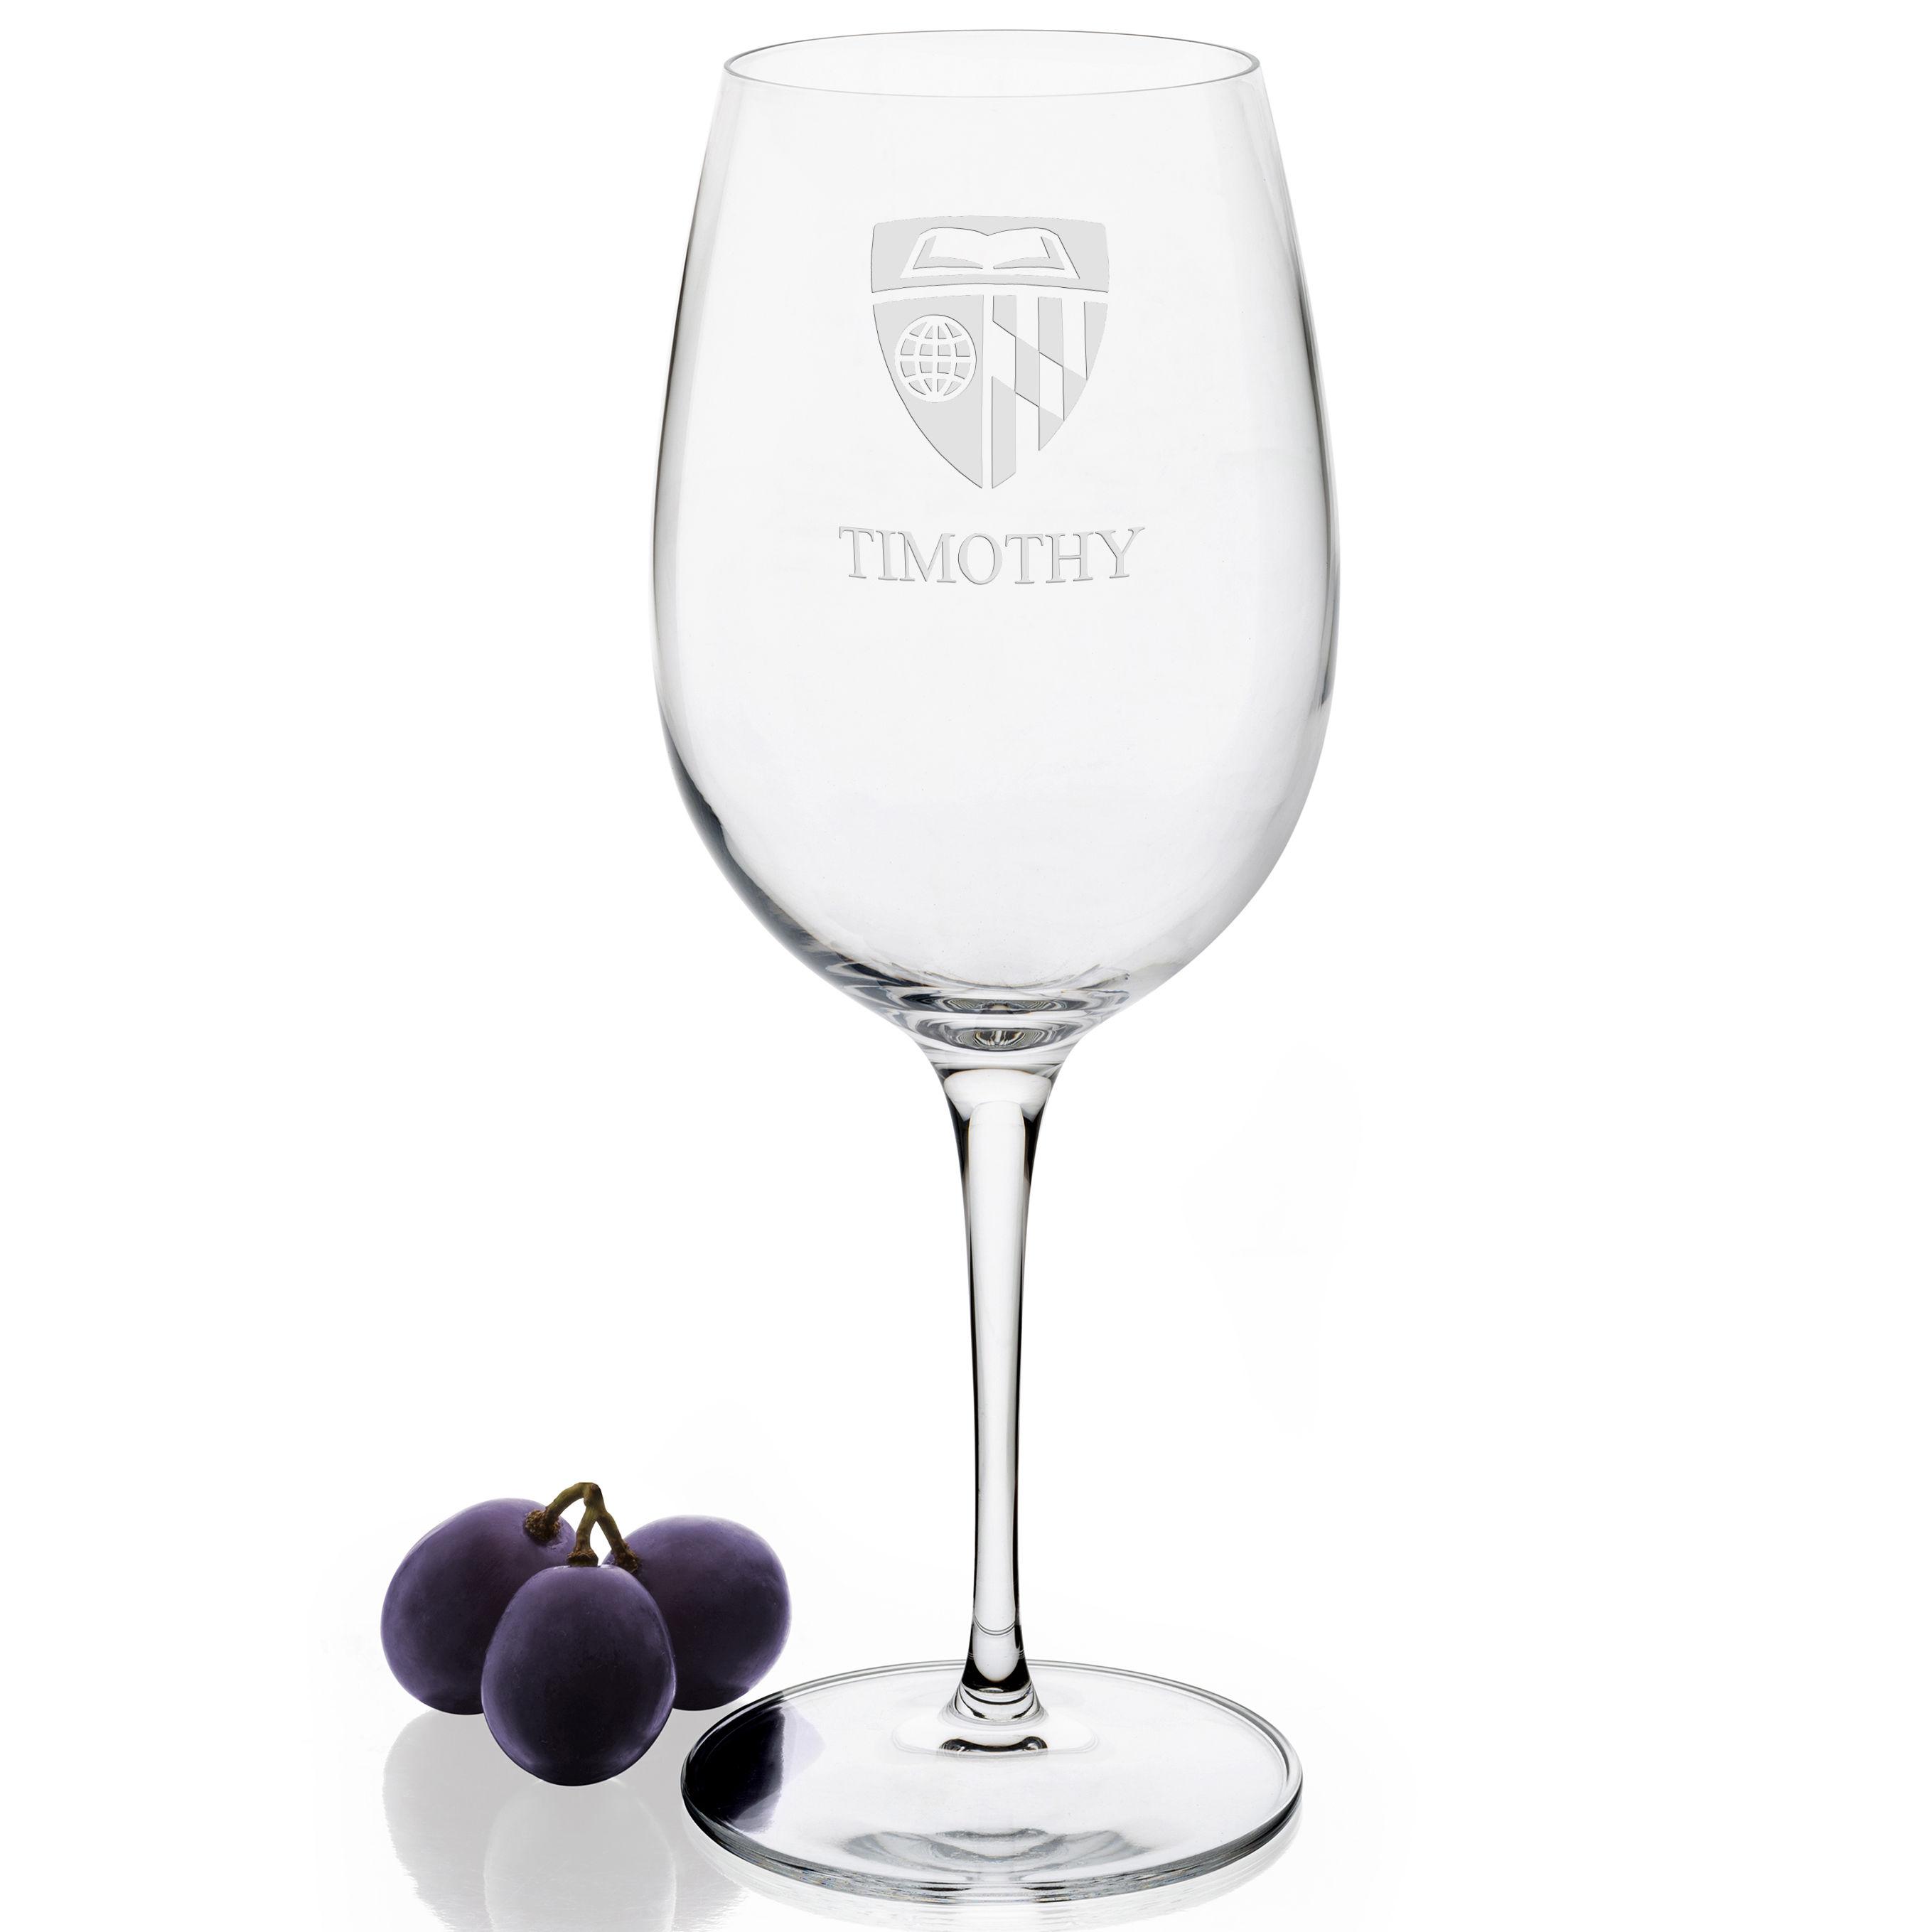 Johns Hopkins University Red Wine Glasses - Set of 2 - Image 2